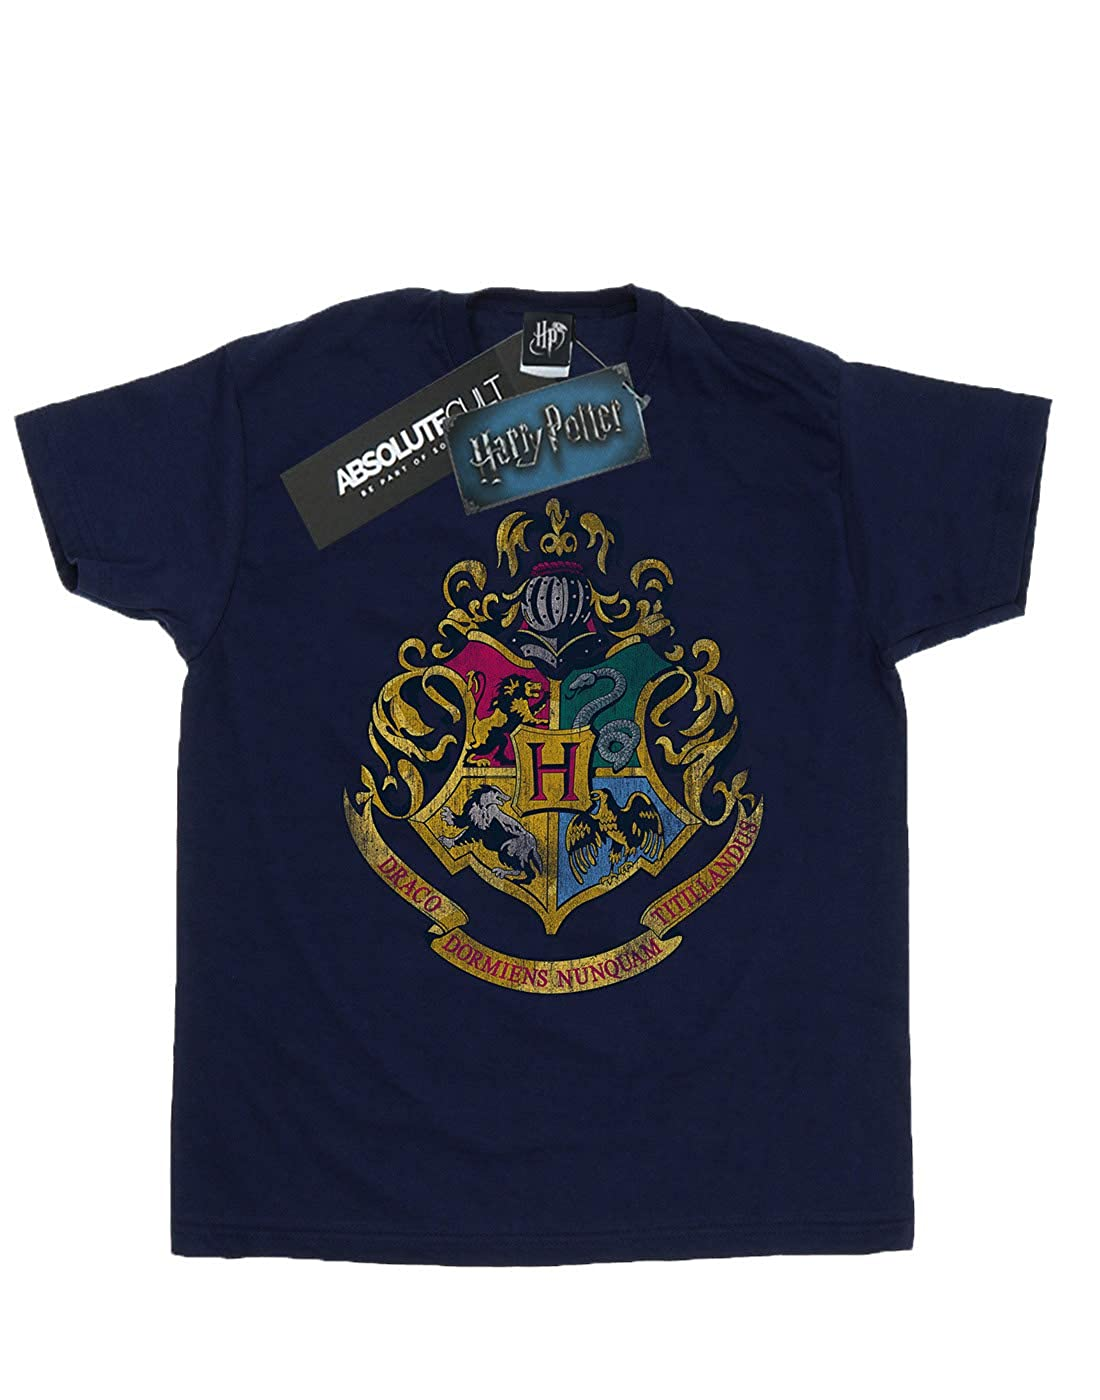 HARRY POTTER Hombre Hogwarts Distressed Crest Camiseta ...